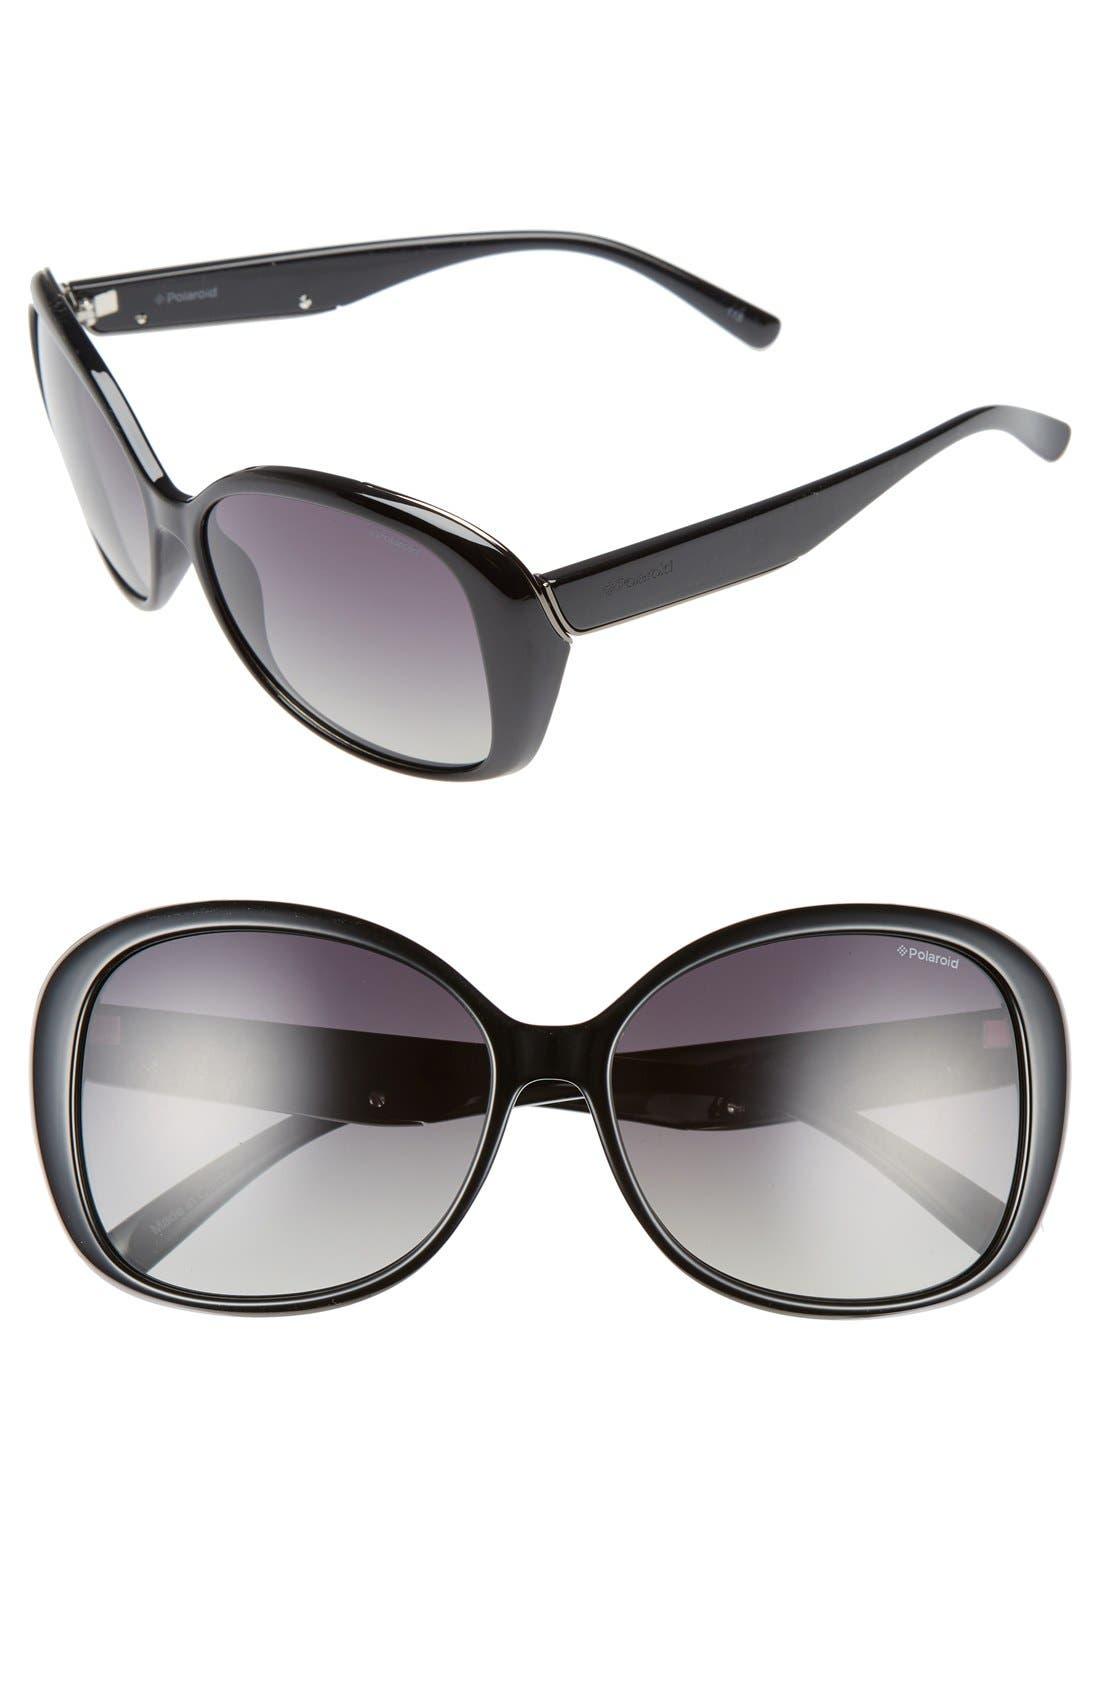 Polaroid 59mm Polarized Sunglasses